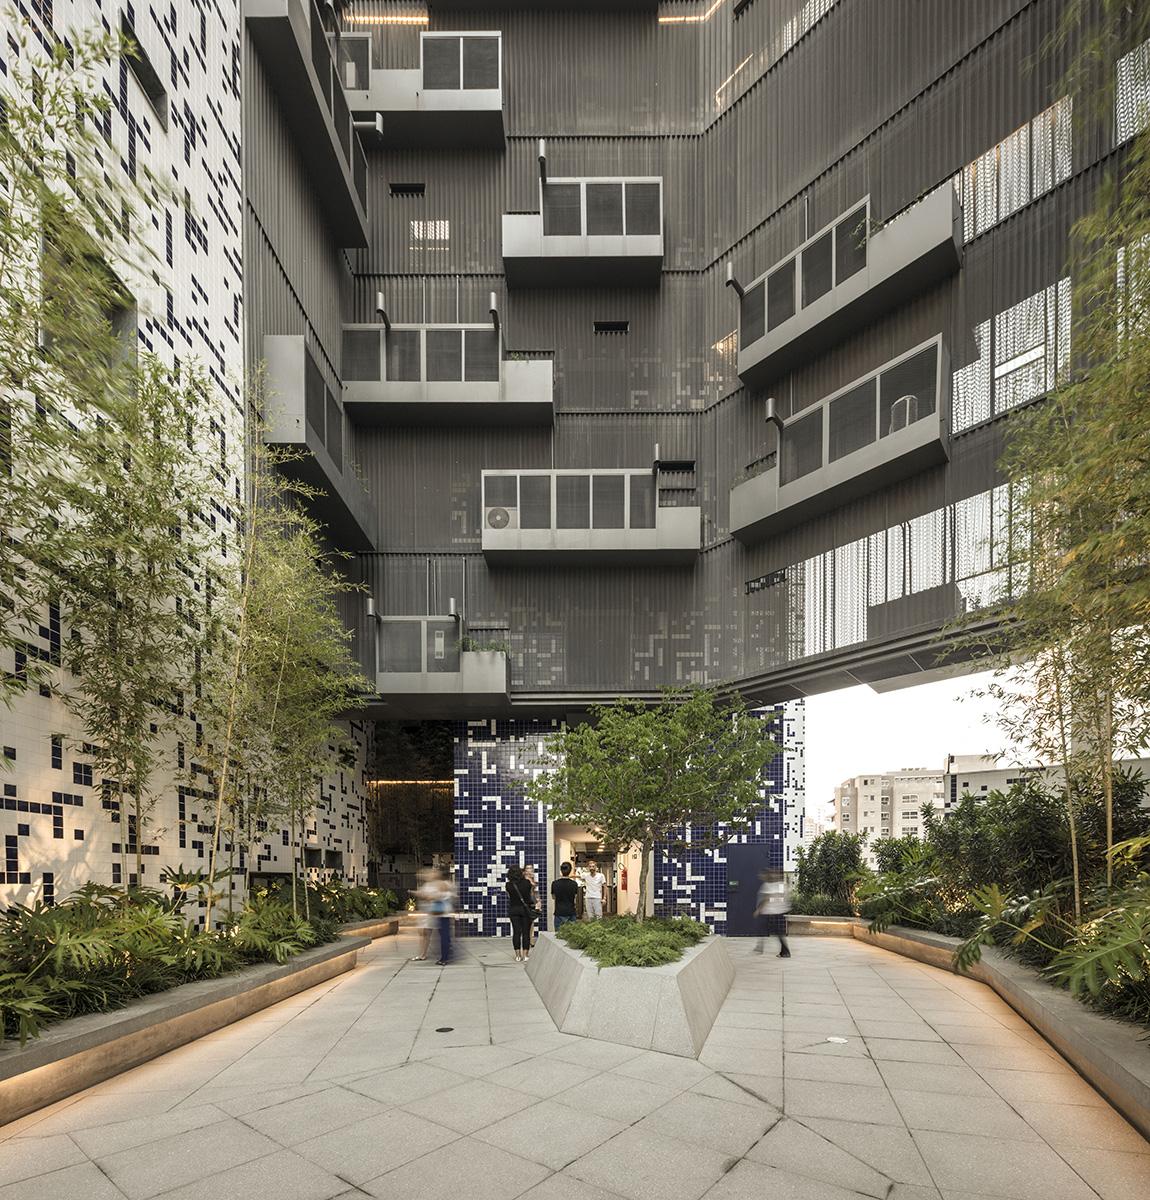 04-arapiraca-triptyque-architecture-foto-fernando-guerra